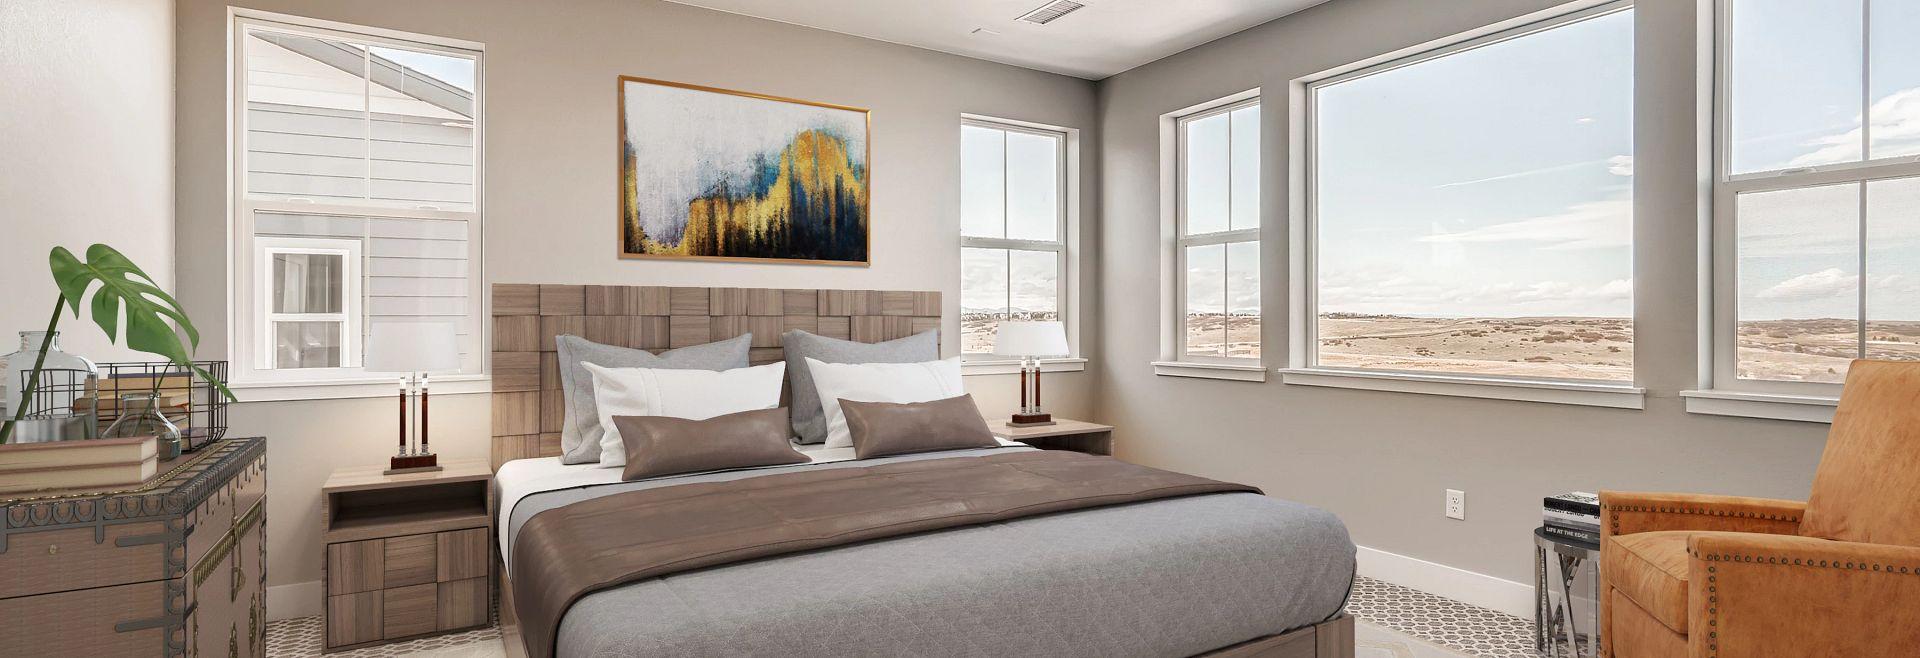 Canyons Gallery Merrick Master Bedroom